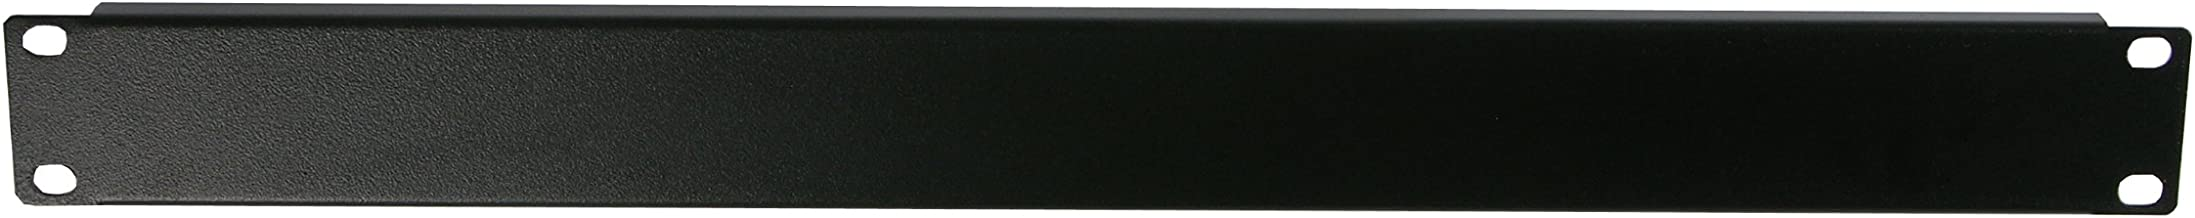 Odyssey APB01 1 Space Blank Rack Panel Accessory